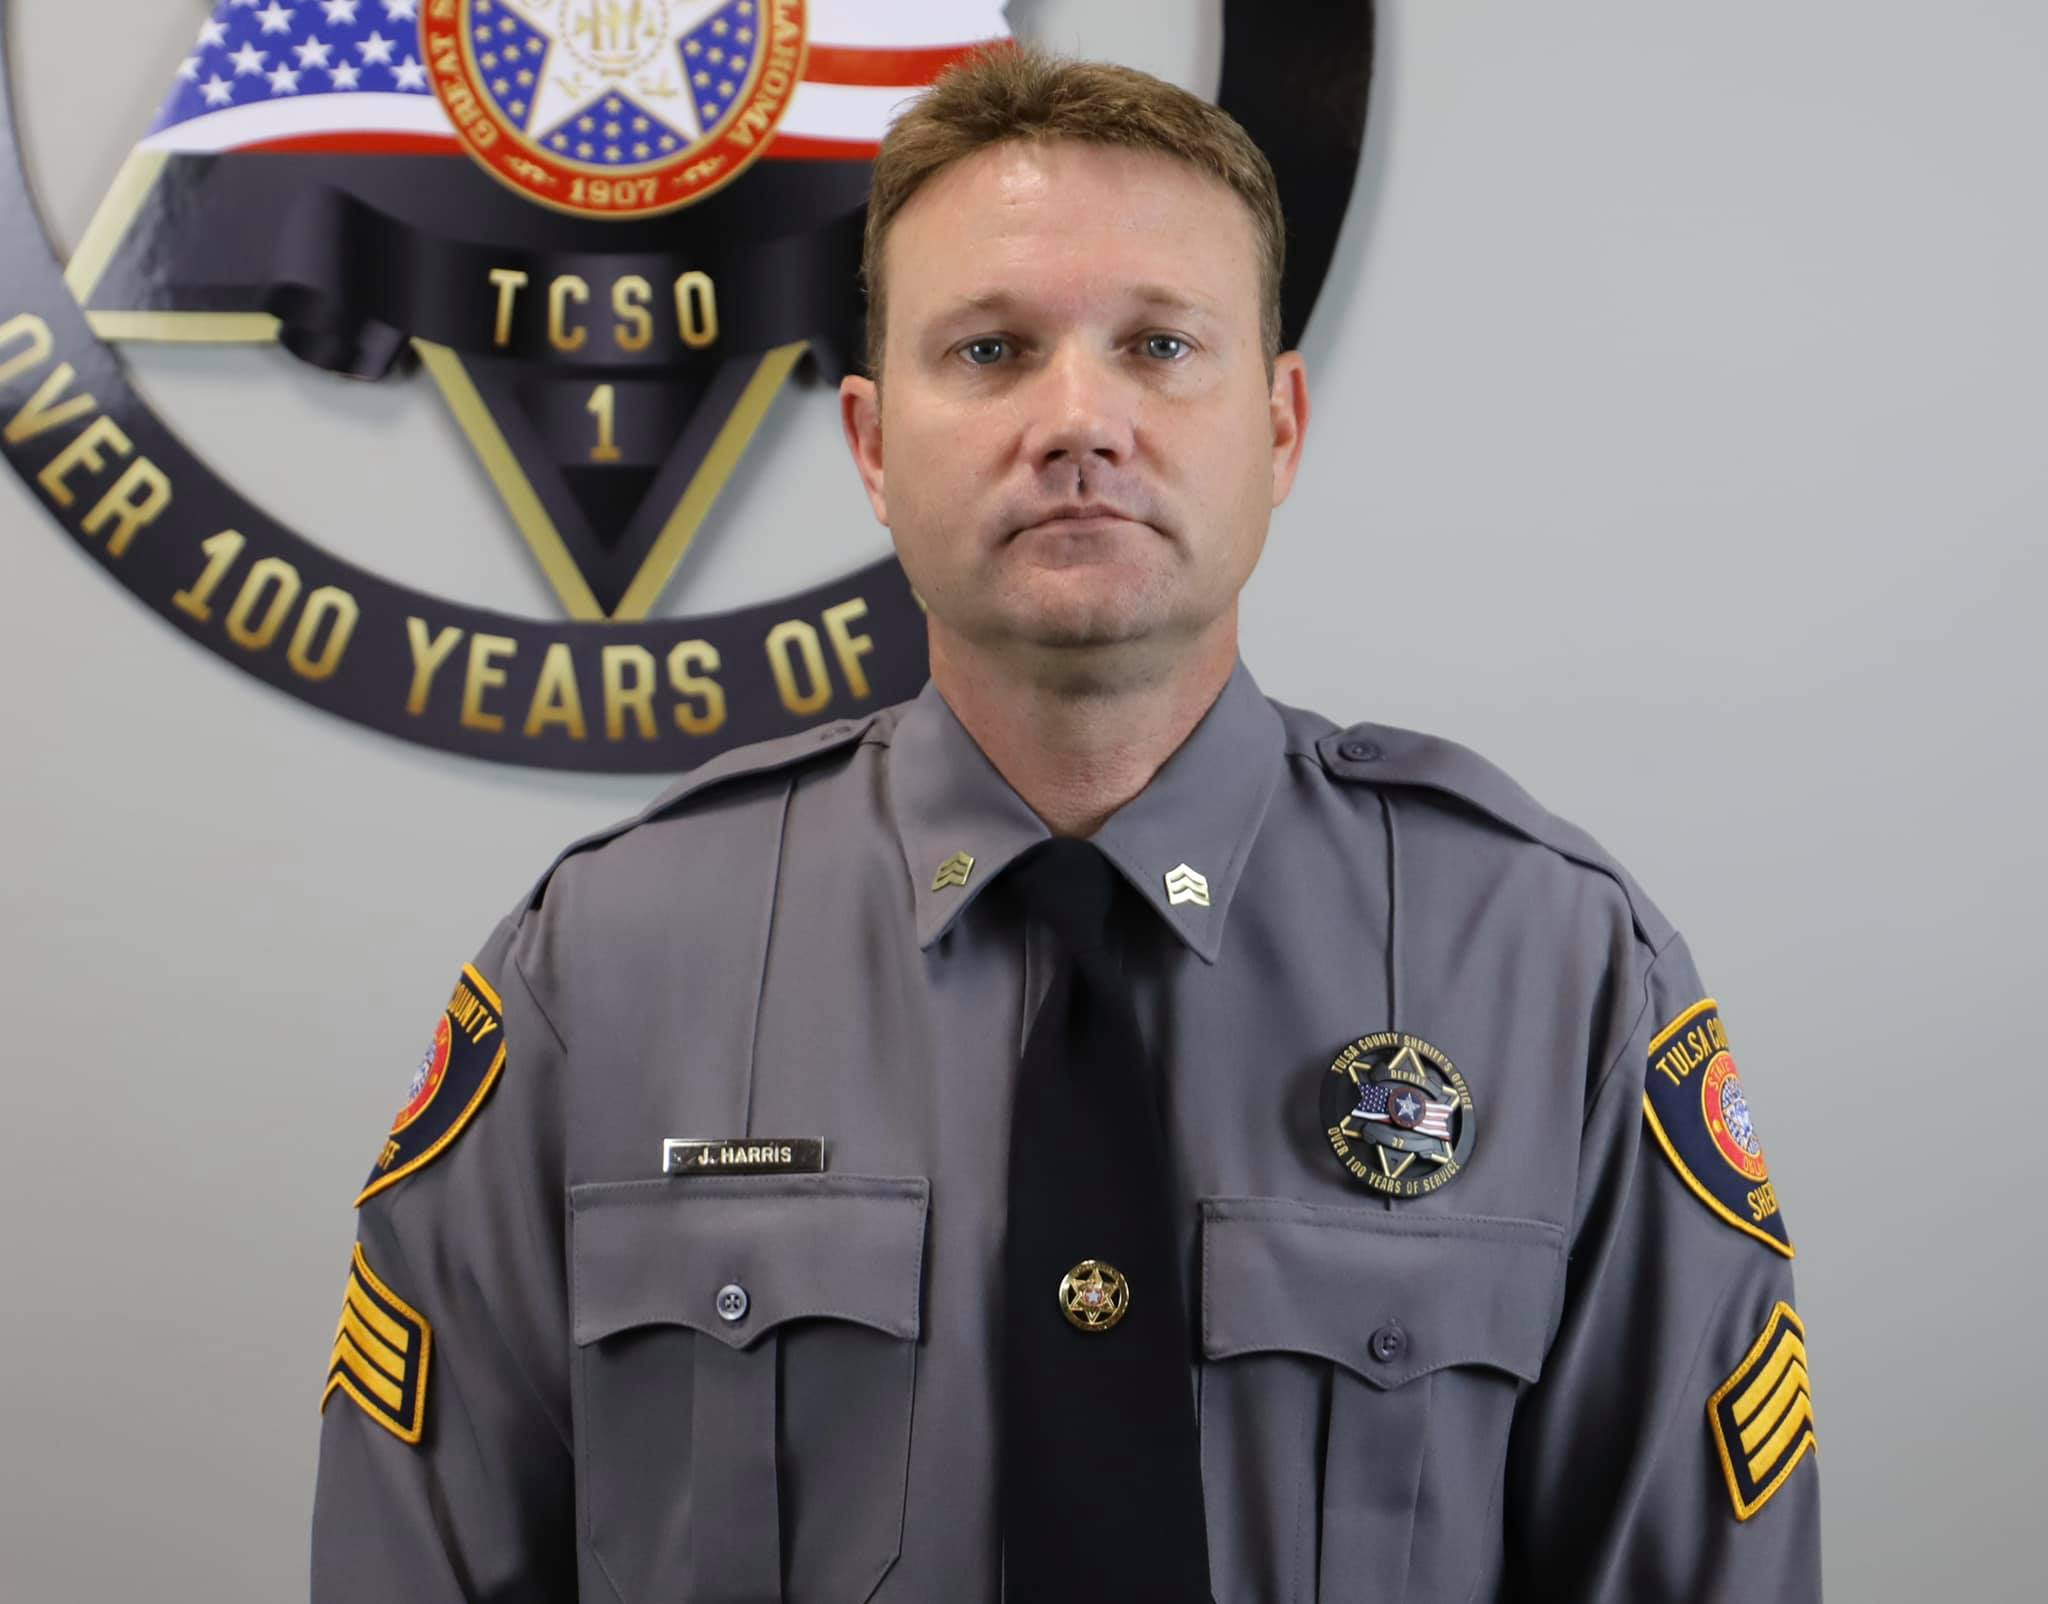 Sergeant John Harris   Tulsa County Sheriff's Office, Oklahoma